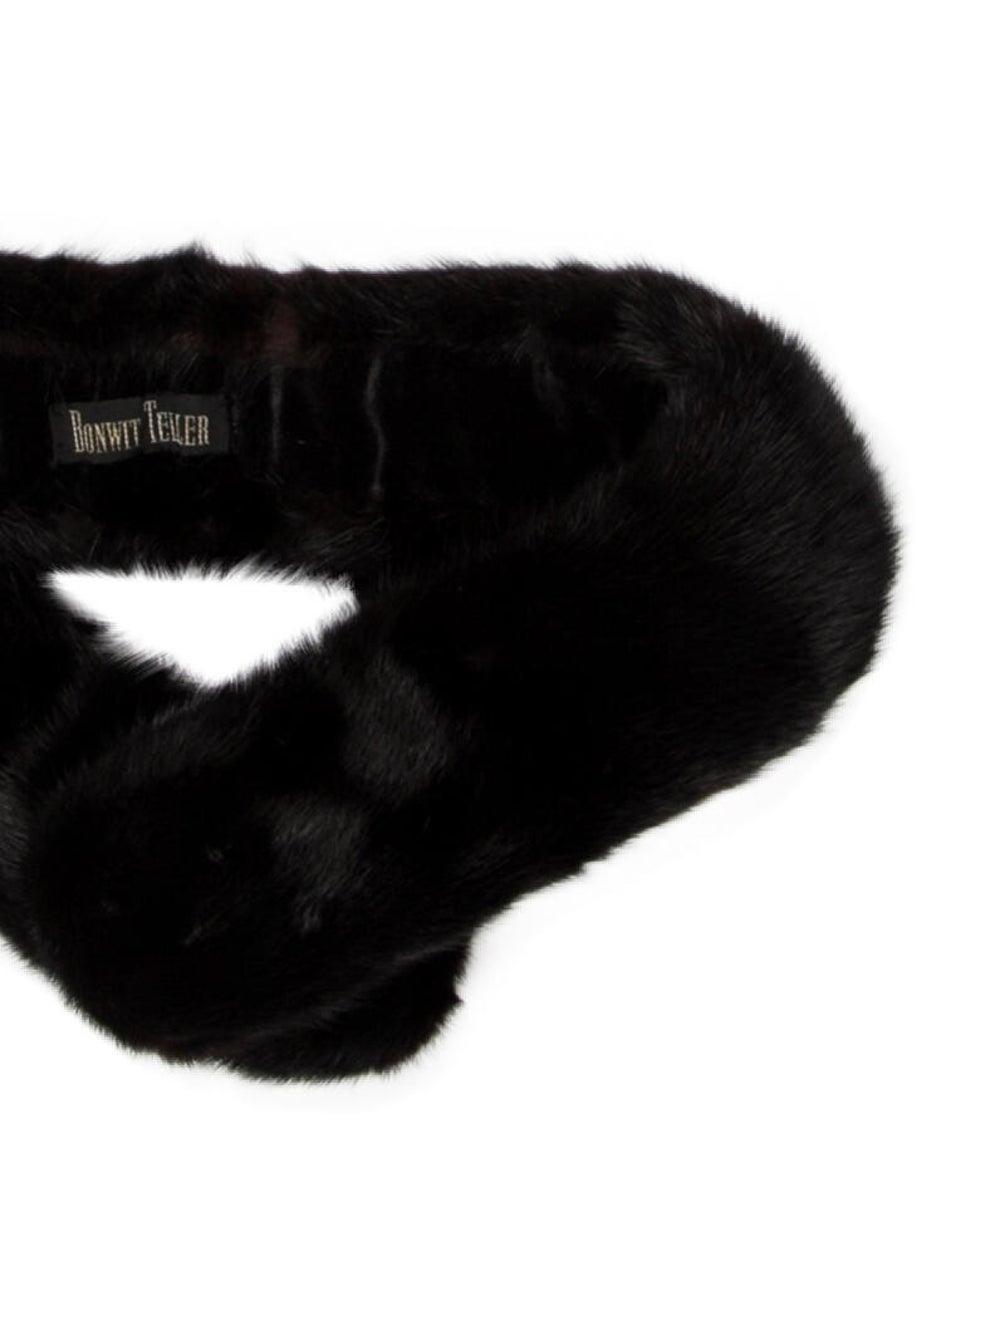 Bonwit Teller Mink Fur Scarf Black - image 2